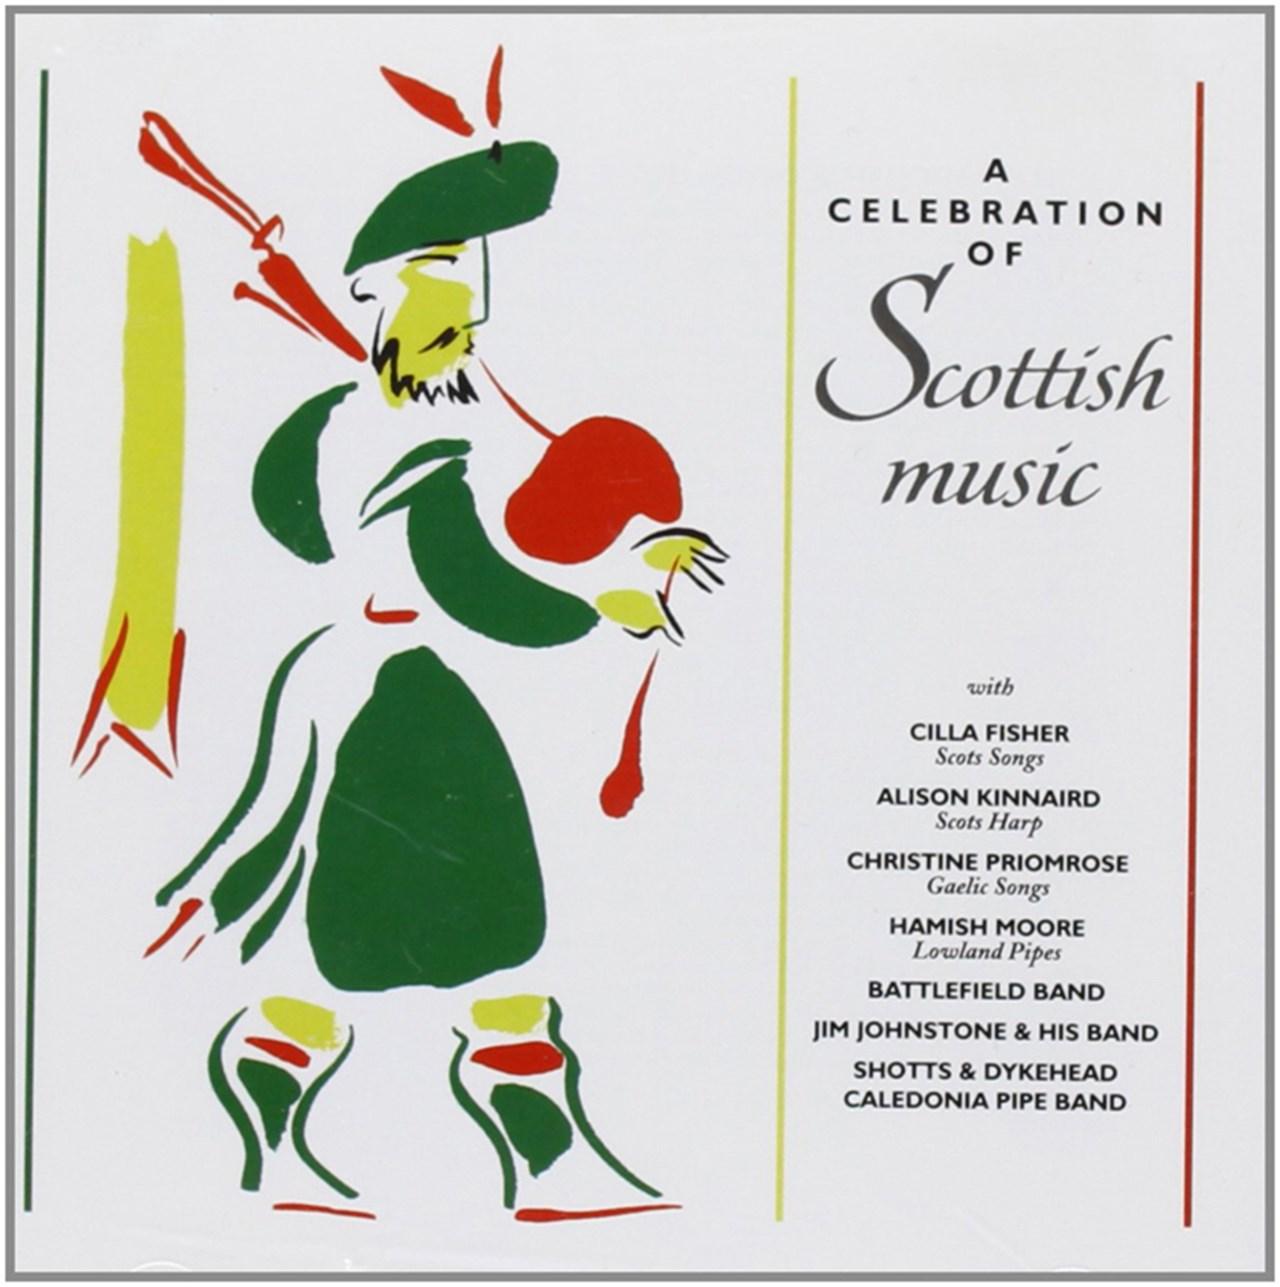 A Celebration of Scottish Music - 1